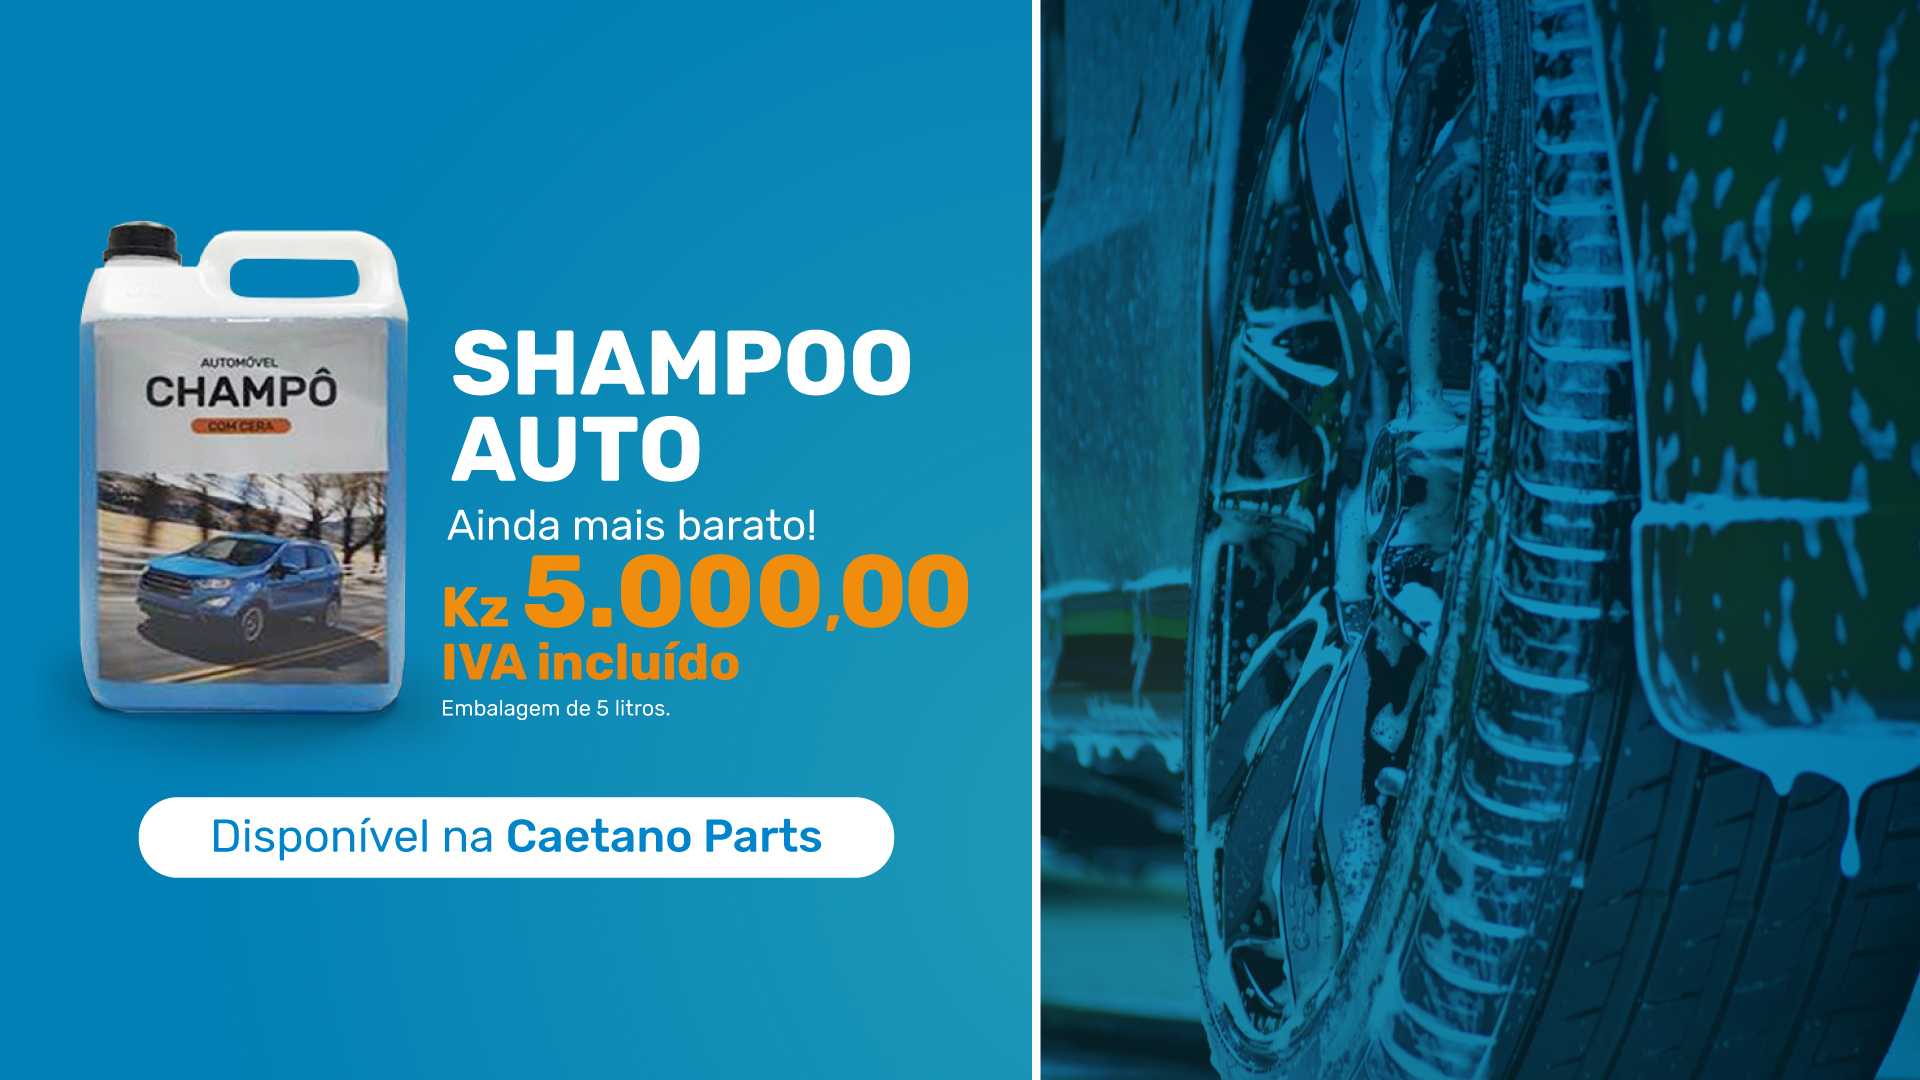 shampoo-banner-desktop